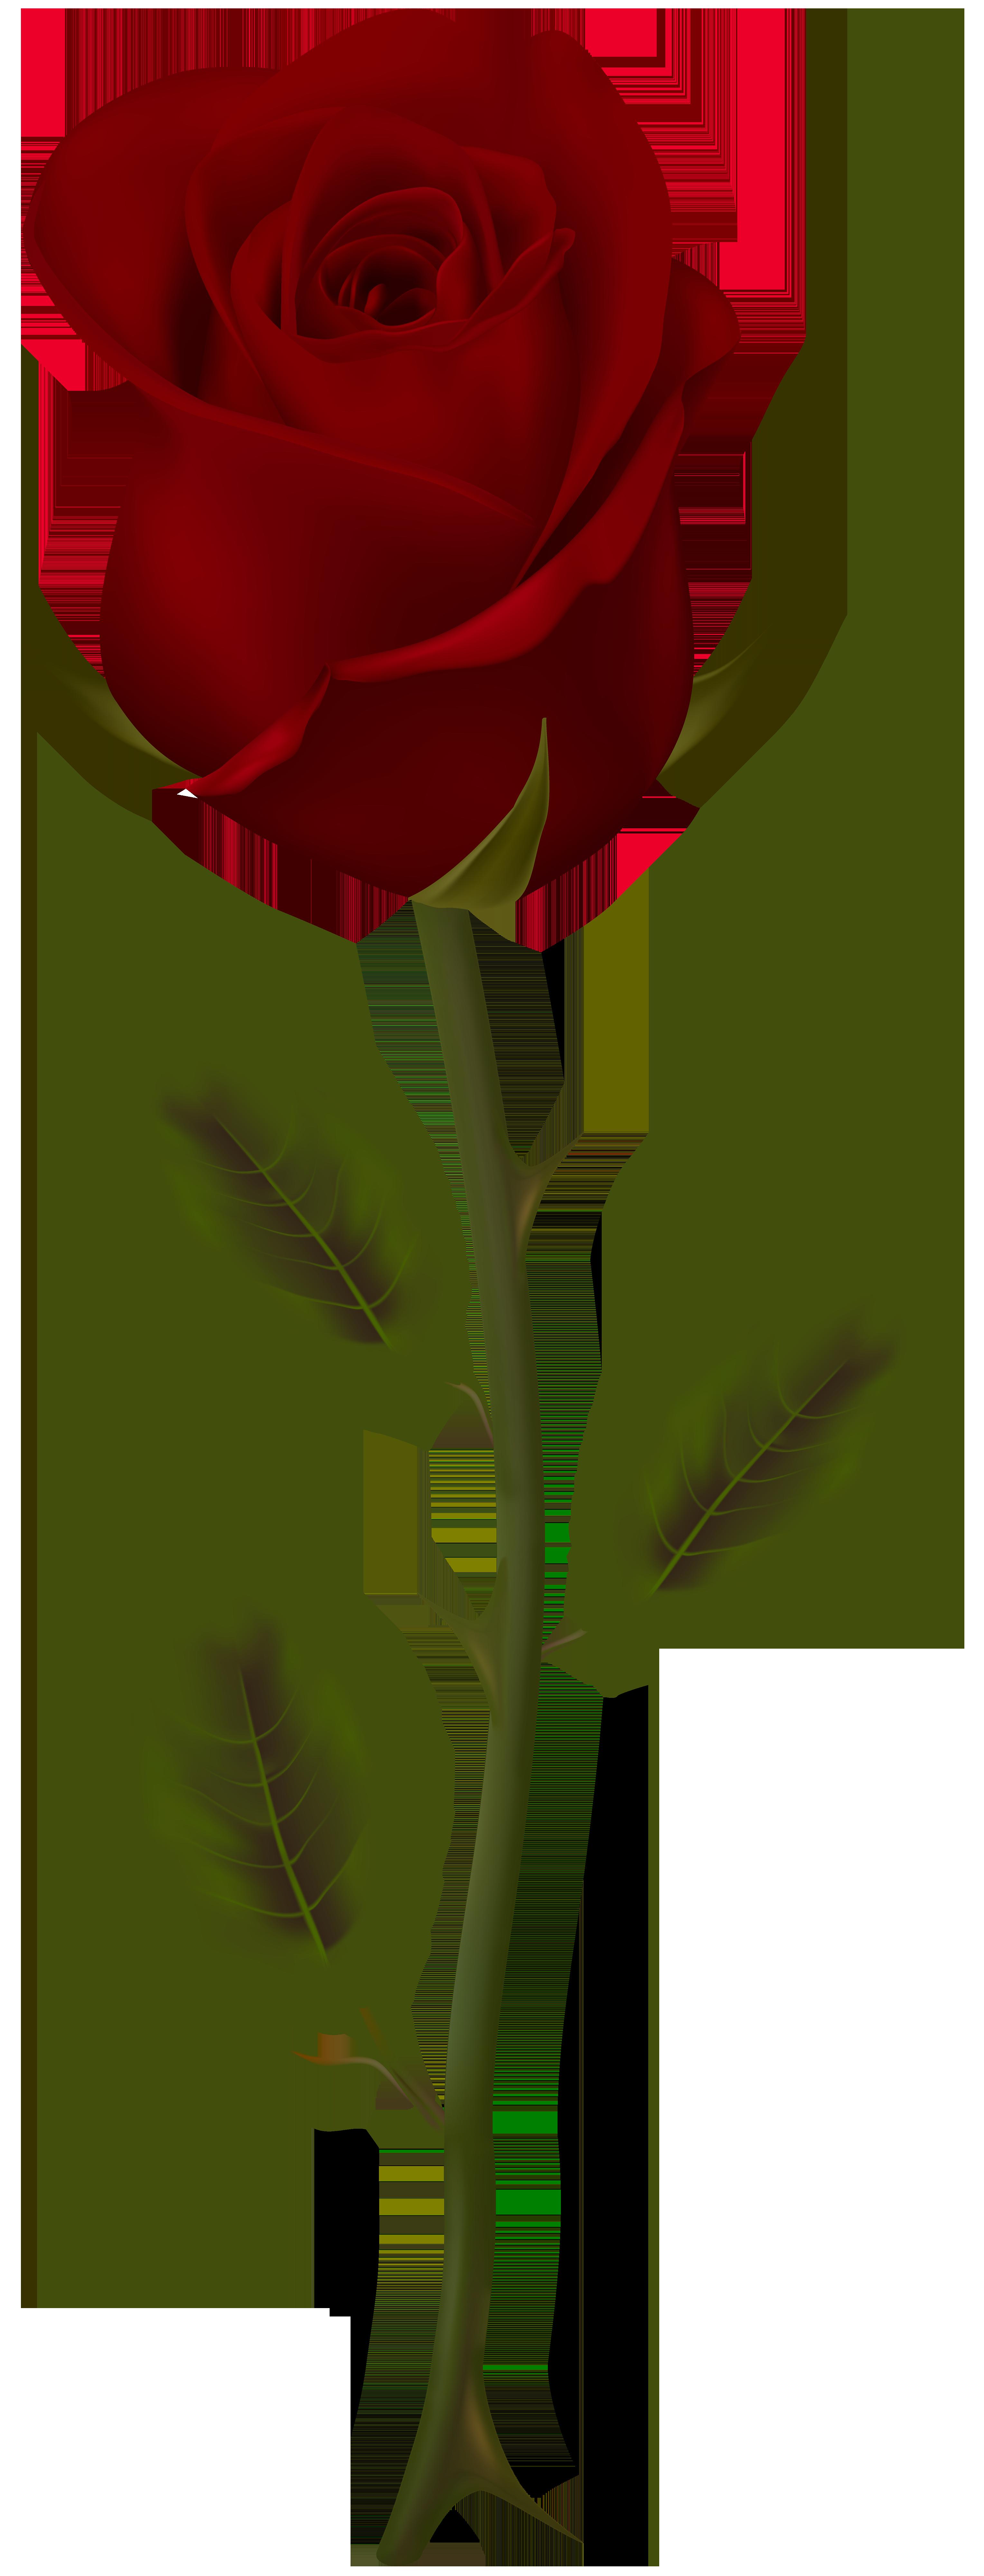 Dark Red Rose Transparent PNG Clip Art Розы, Красивые цветы